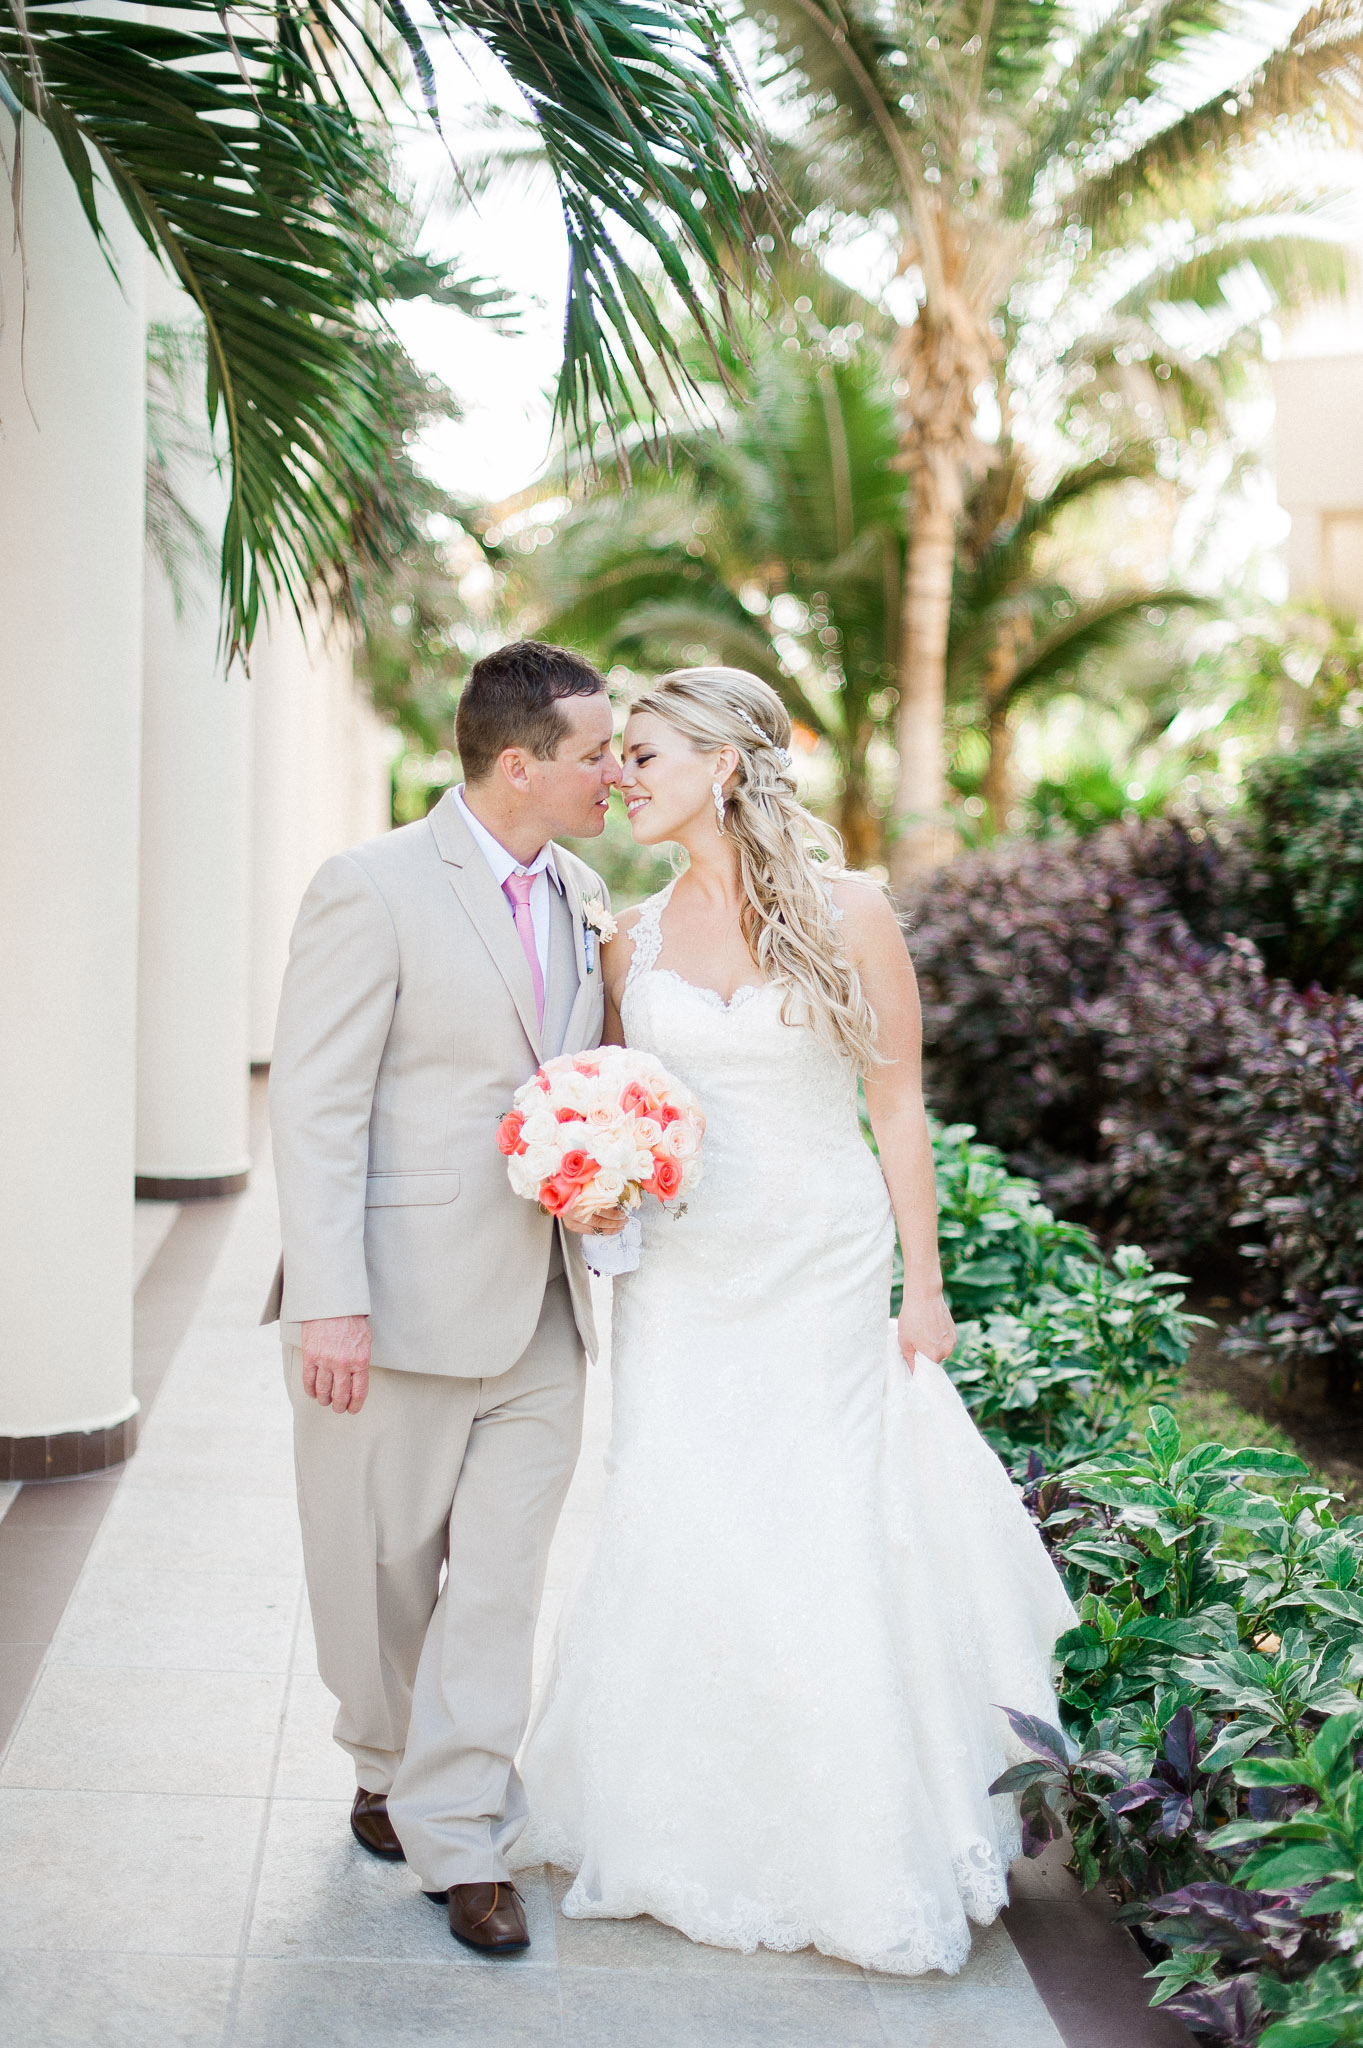 Megan and Chris wedding-36.jpg